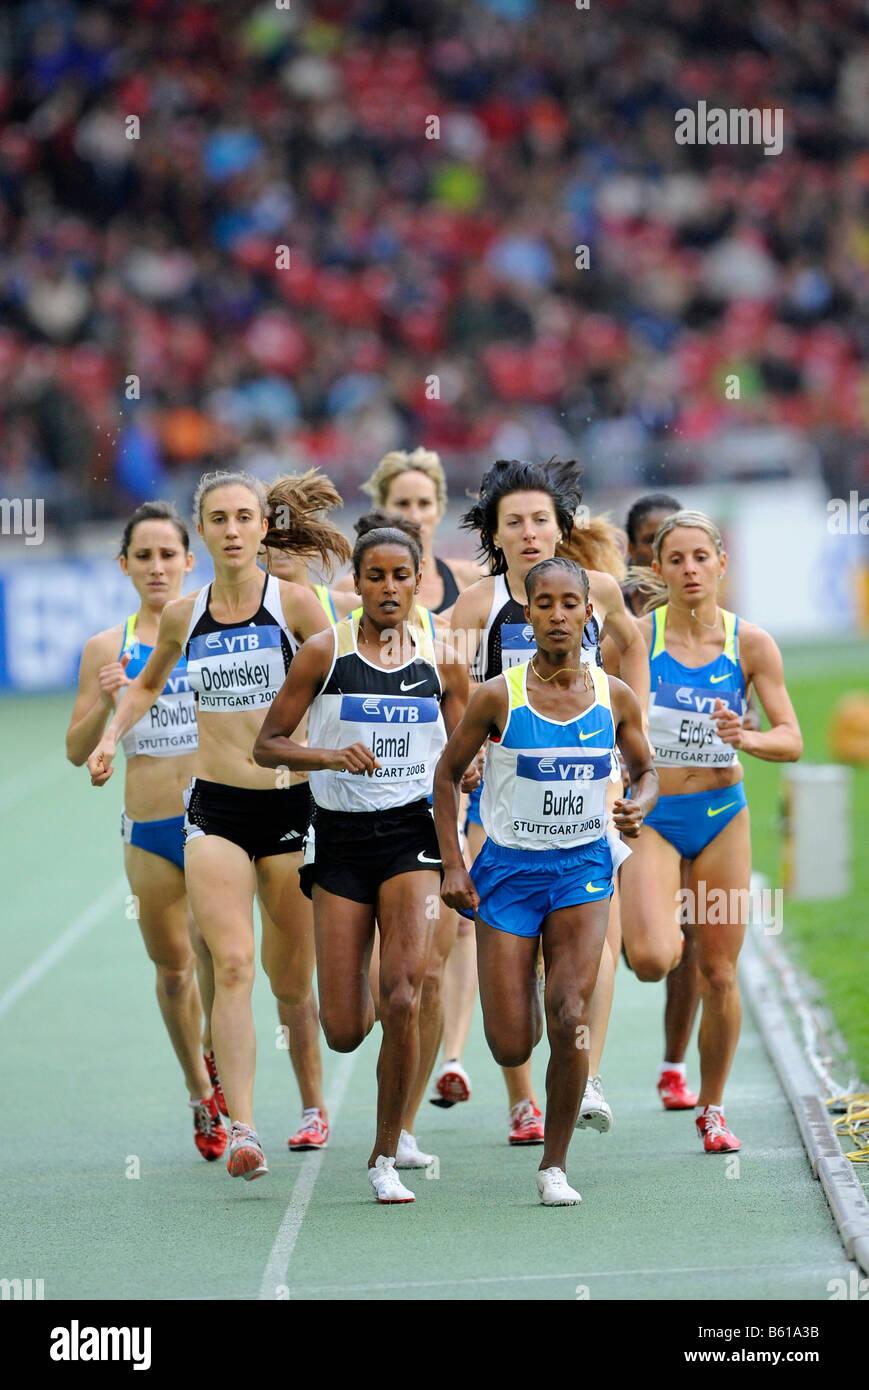 Maryam Yusuf JAMAL, BRN, winner of the 1500m, in front of Gelete BURKA, ETH, at the IAAF 2008 World Athletics Final - Stock Image